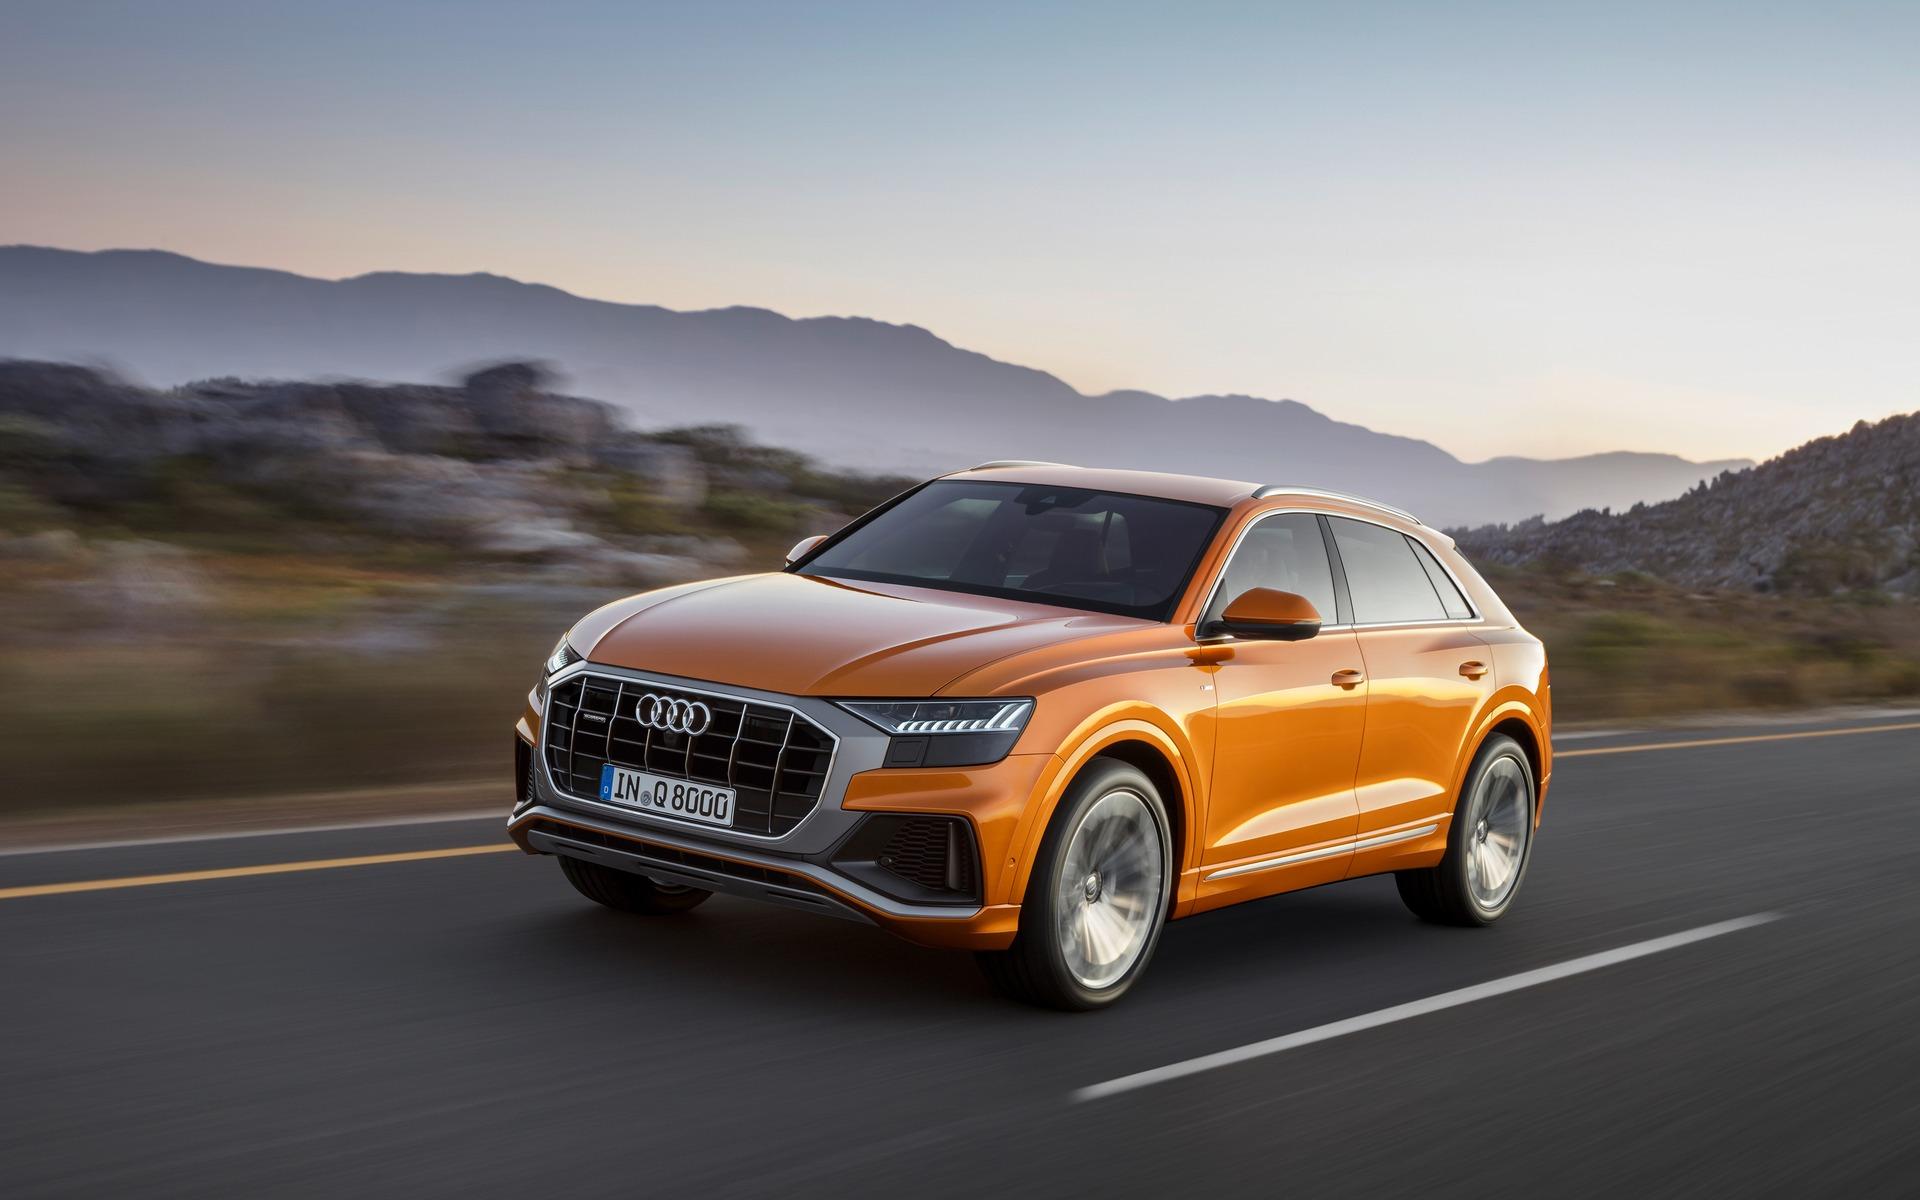 2019 Audi Q8 on the road